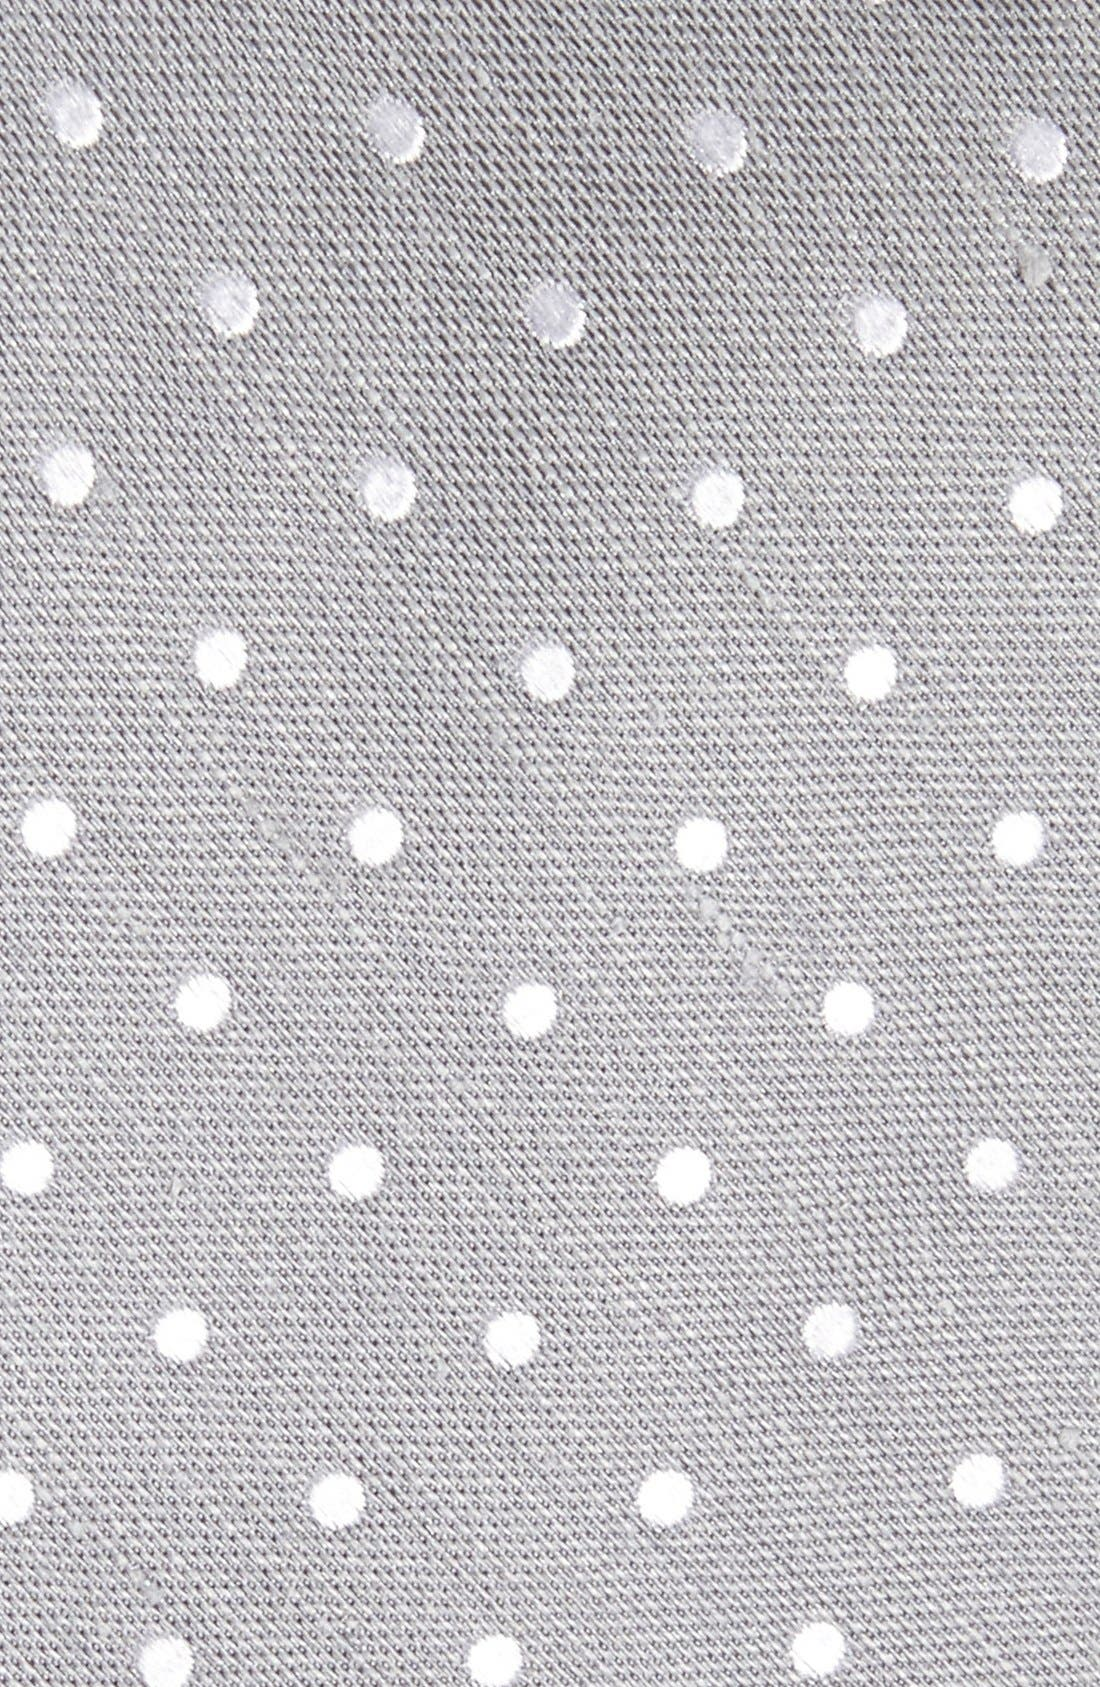 Dot Silk & Linen Tie,                             Alternate thumbnail 2, color,                             Silver